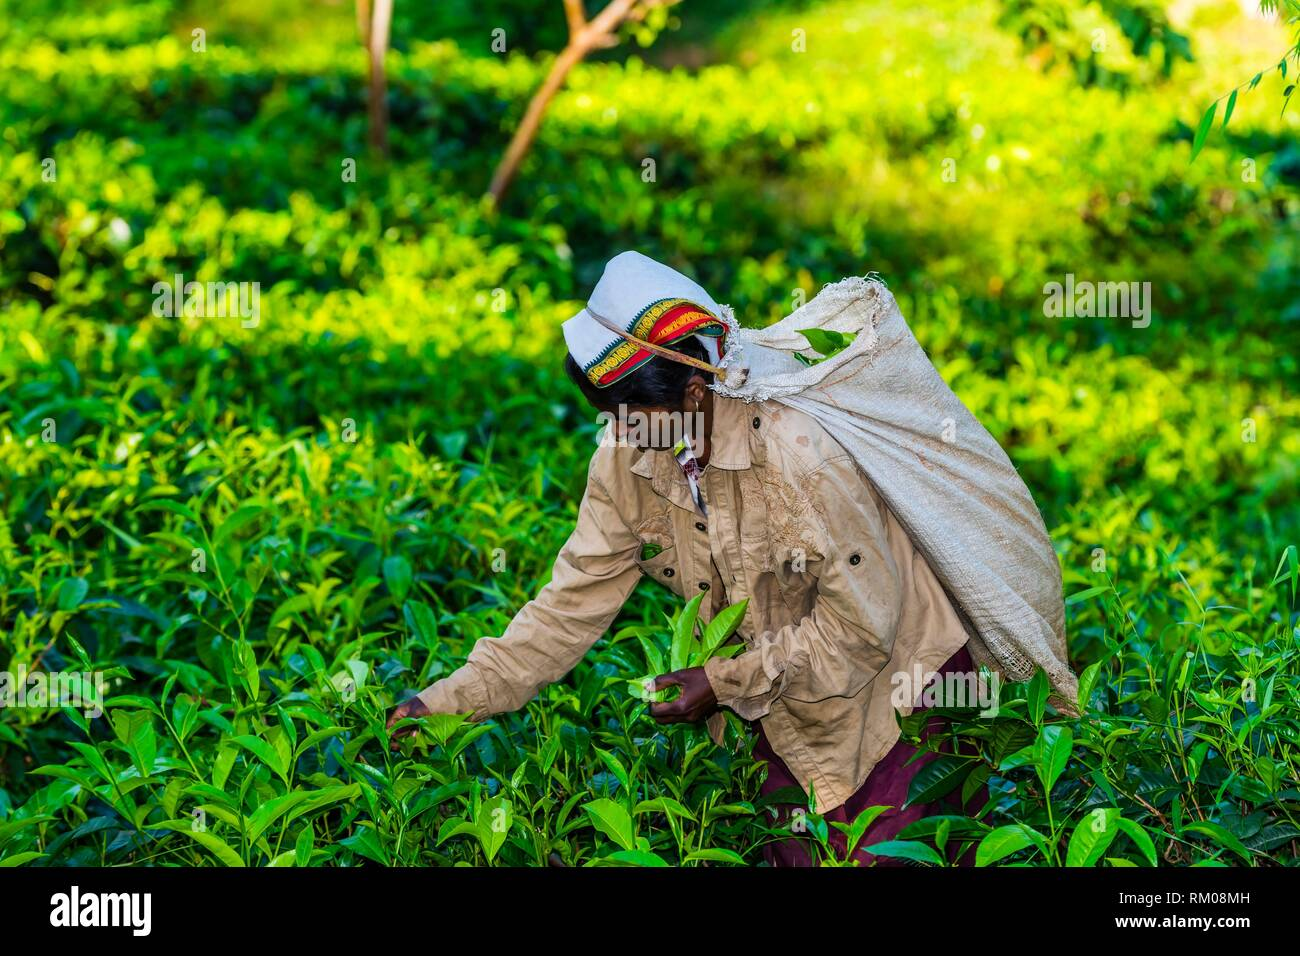 Women picking tea, Ambagollapathana, near Ella, Uva Province, Sri Lanka. - Stock Image